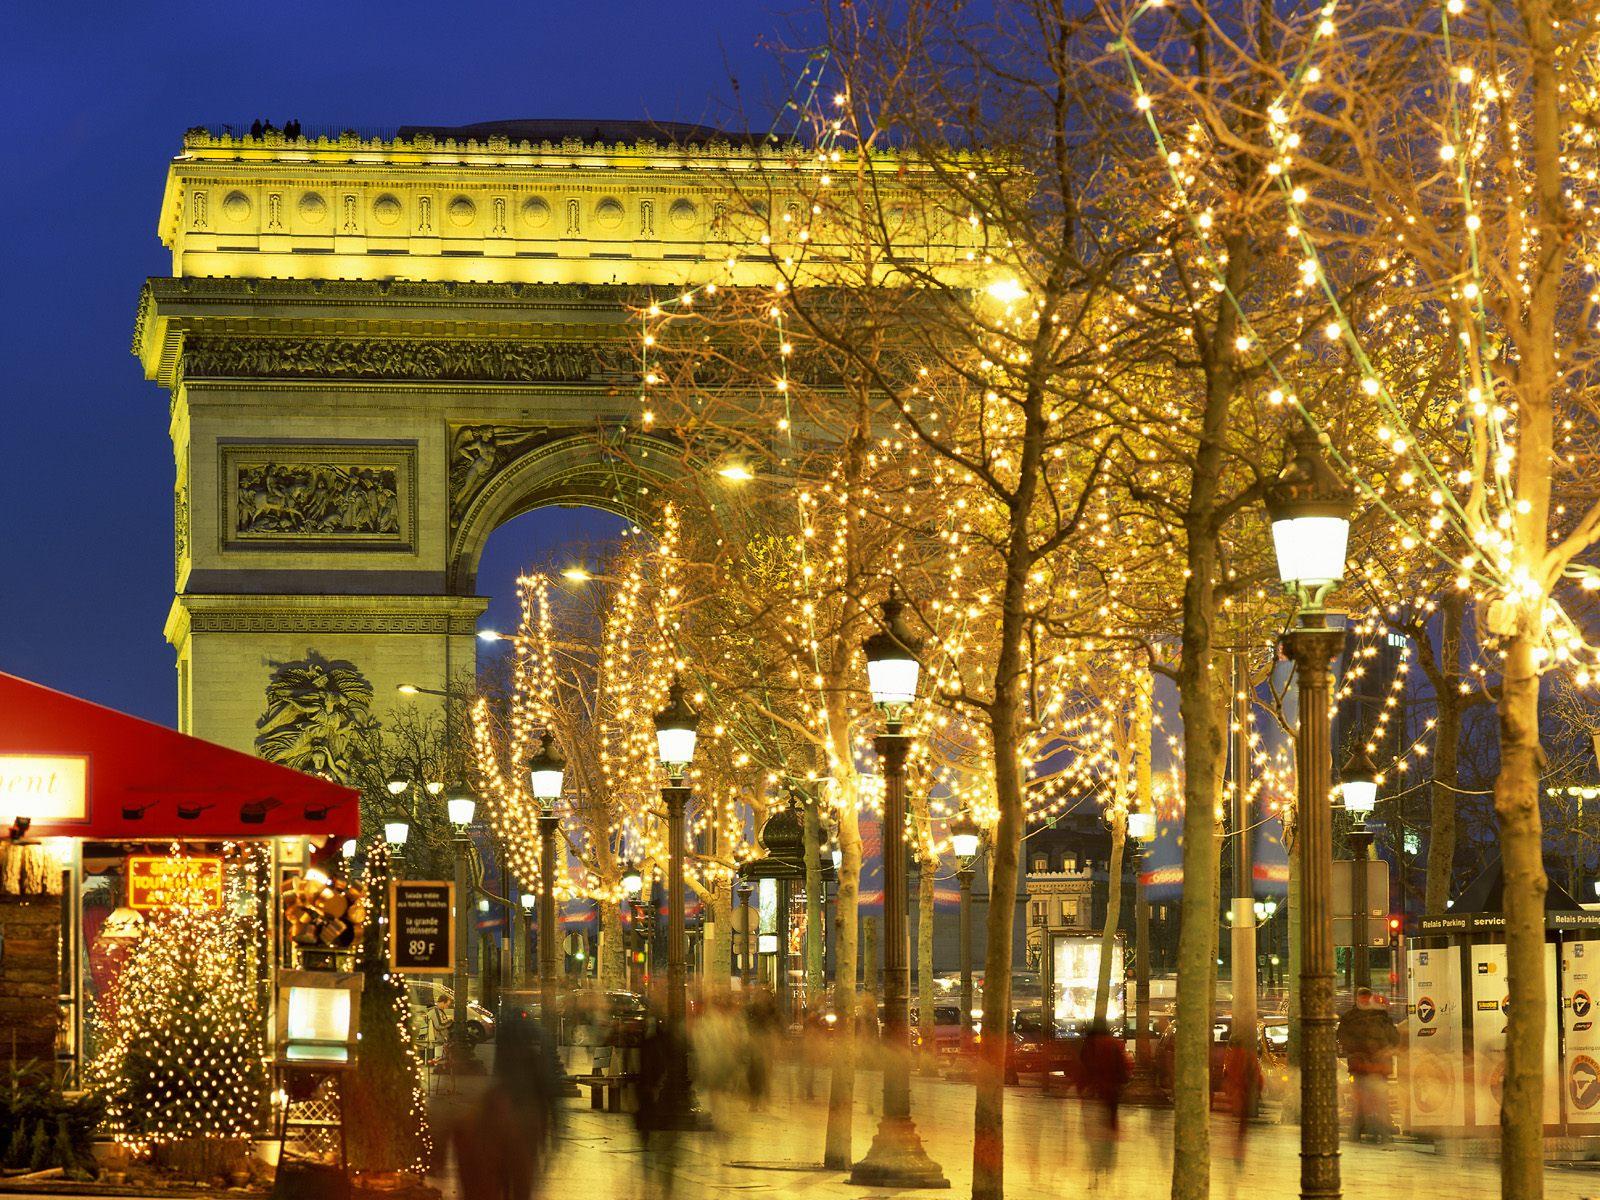 http://1.bp.blogspot.com/_fsH_BGIPLhI/SwrhN17ZwOI/AAAAAAAAHH4/OwVyXqSKtvY/s1600/Arc+de+Triomphe,+Paris,+France.jpg